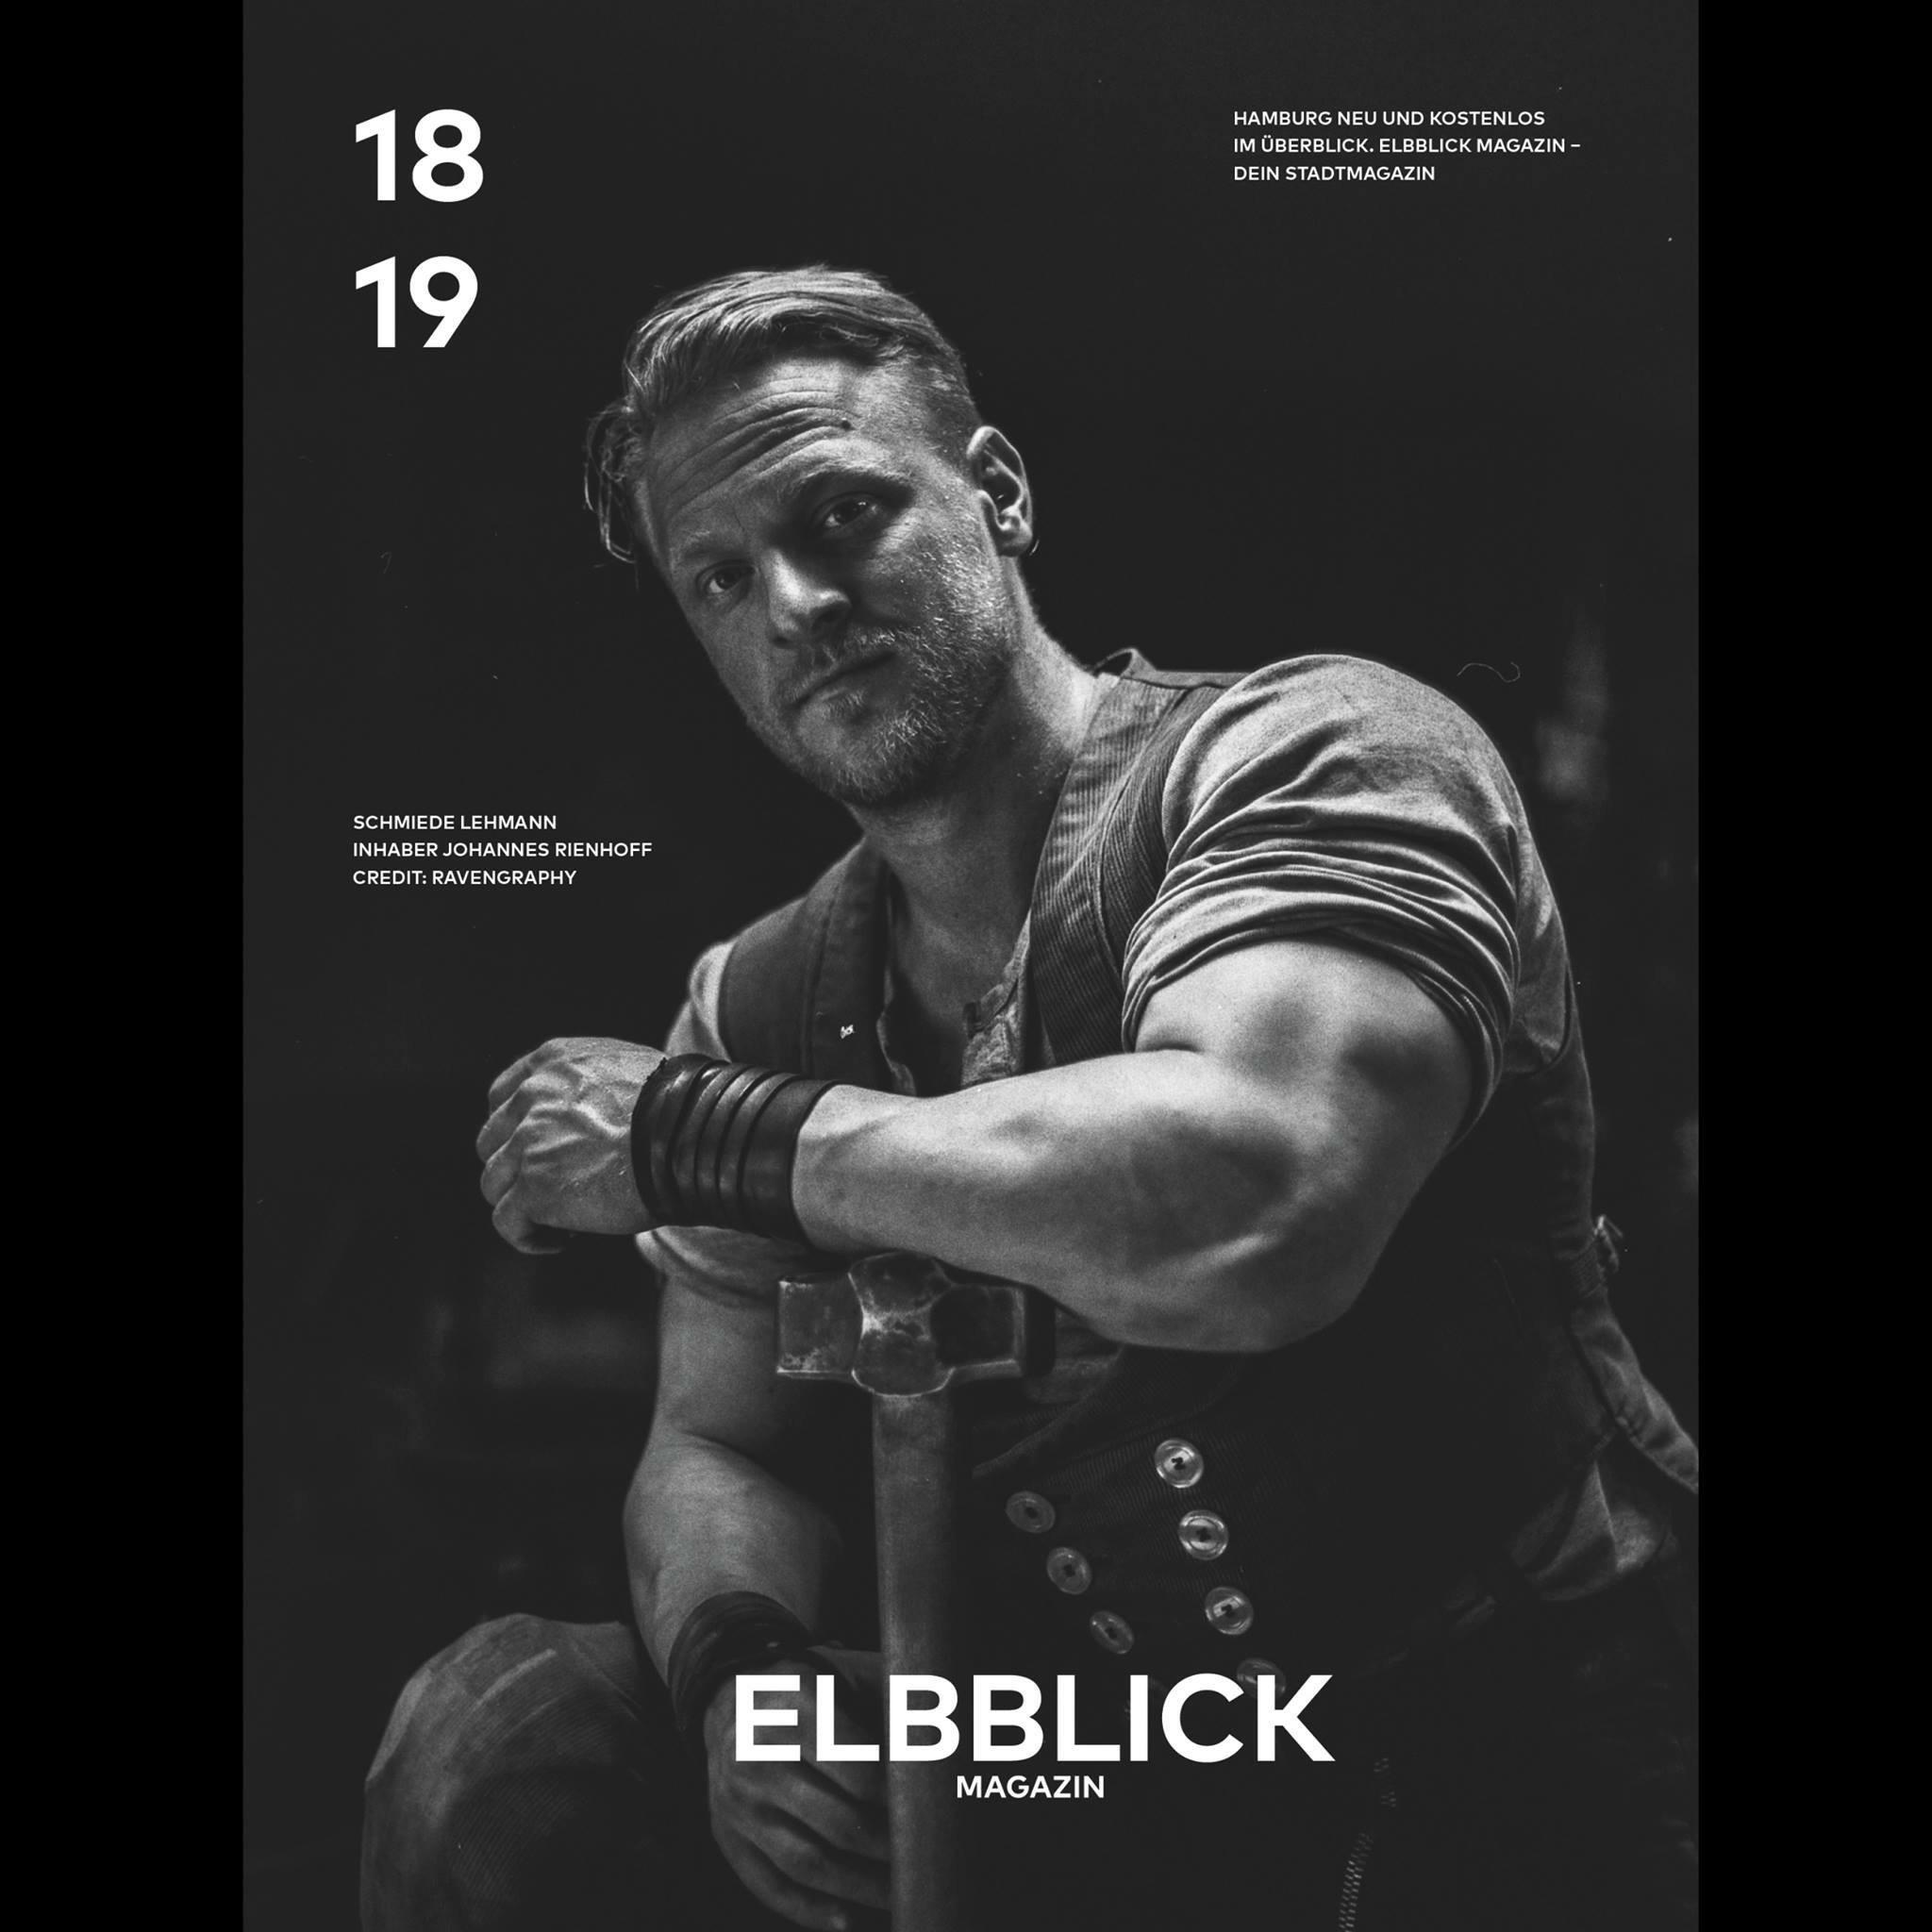 Elbblick Magazin Video